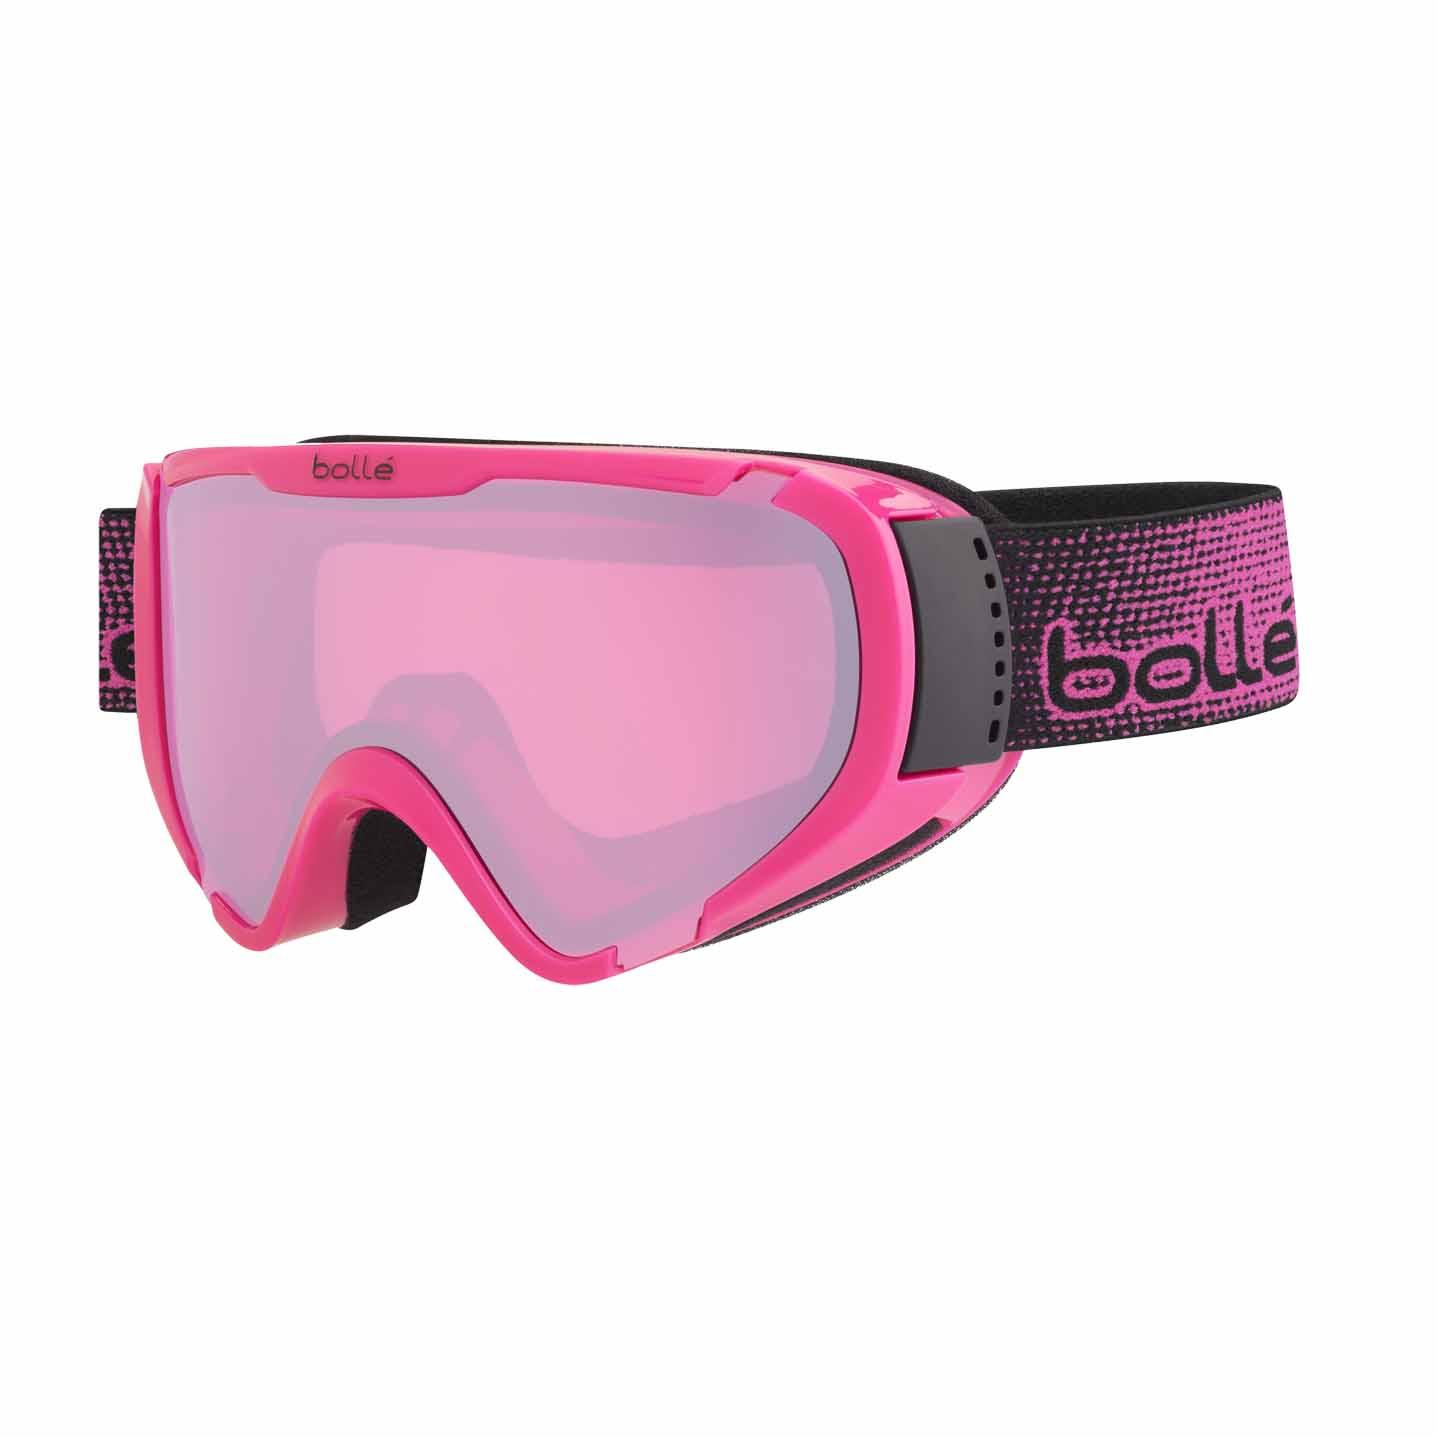 2017-18 Bolle Explorer OTG Ski And Snowboard Goggle ...